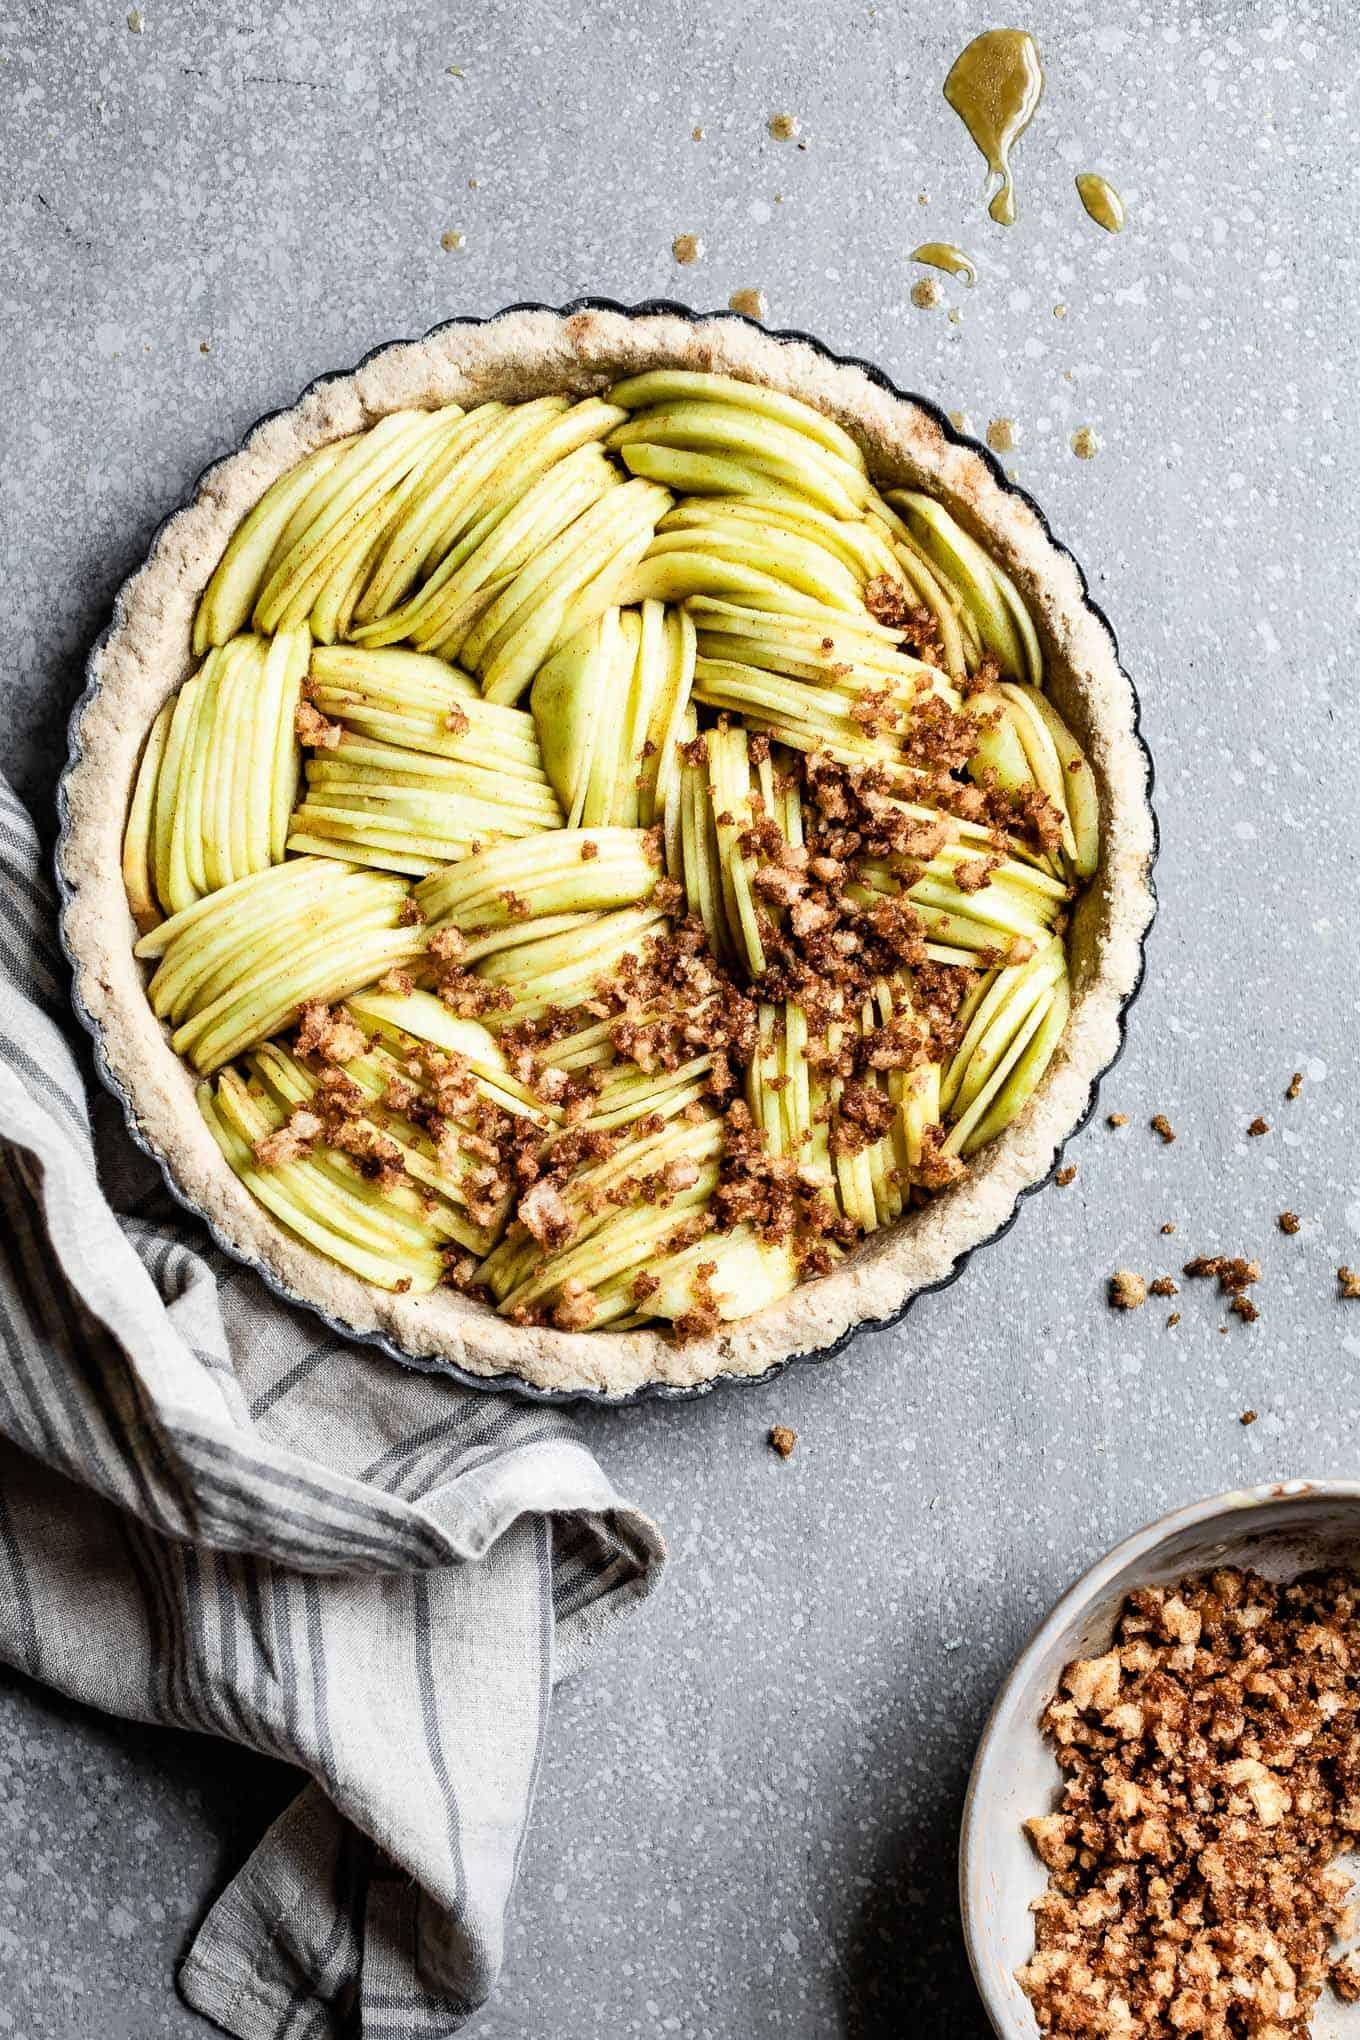 Gluten-Free Fruit Tart with Apples